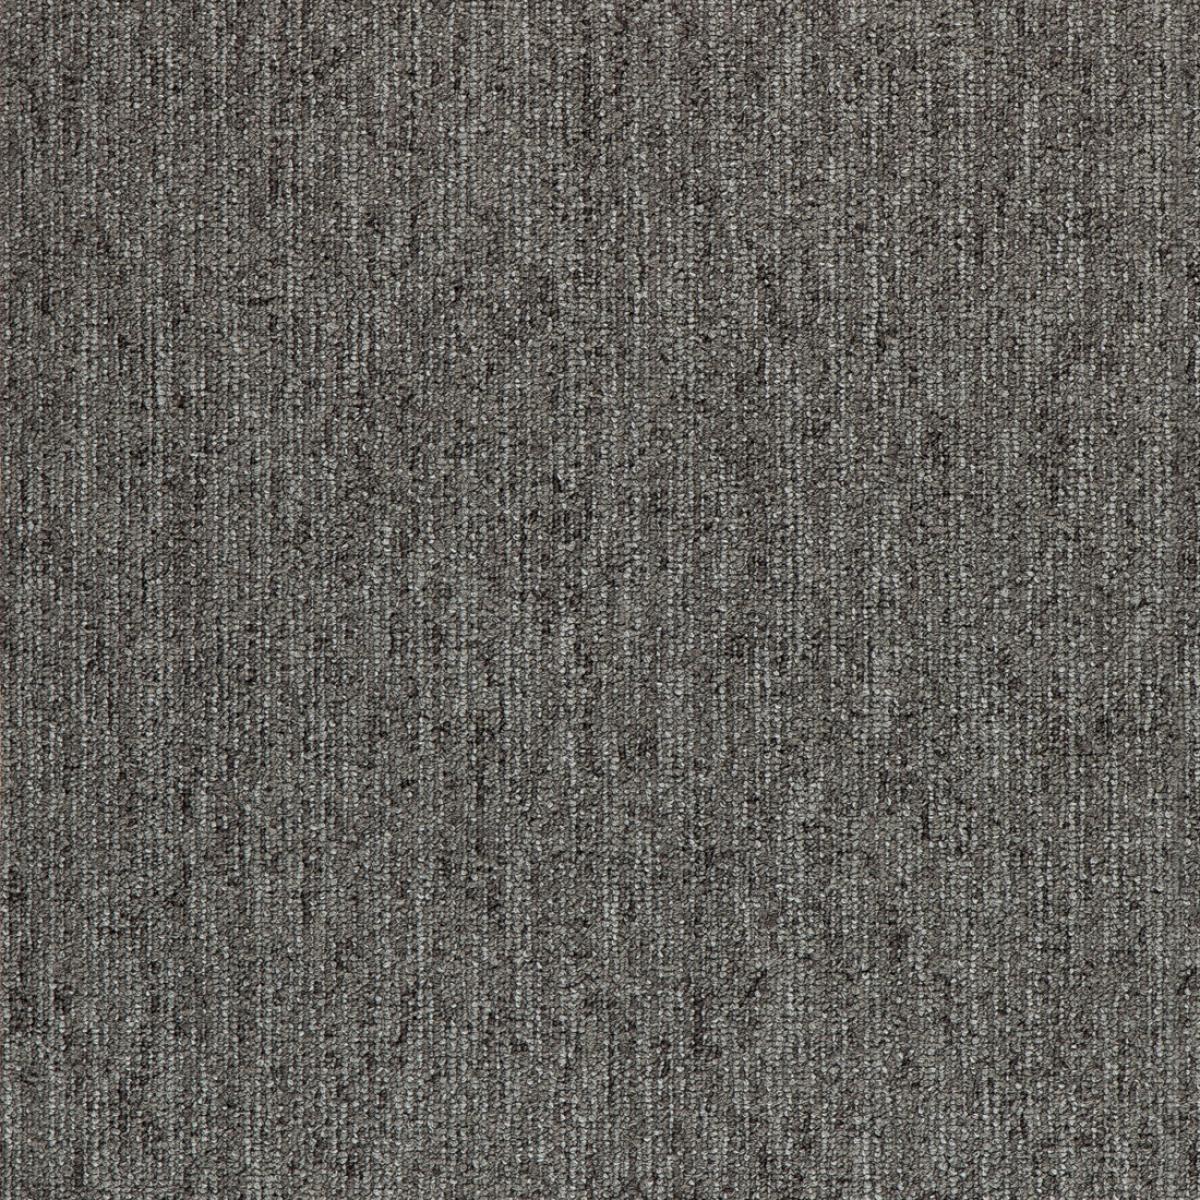 Katalog Kobercov 253 Ch čtverců Milliken Initio Shift Random